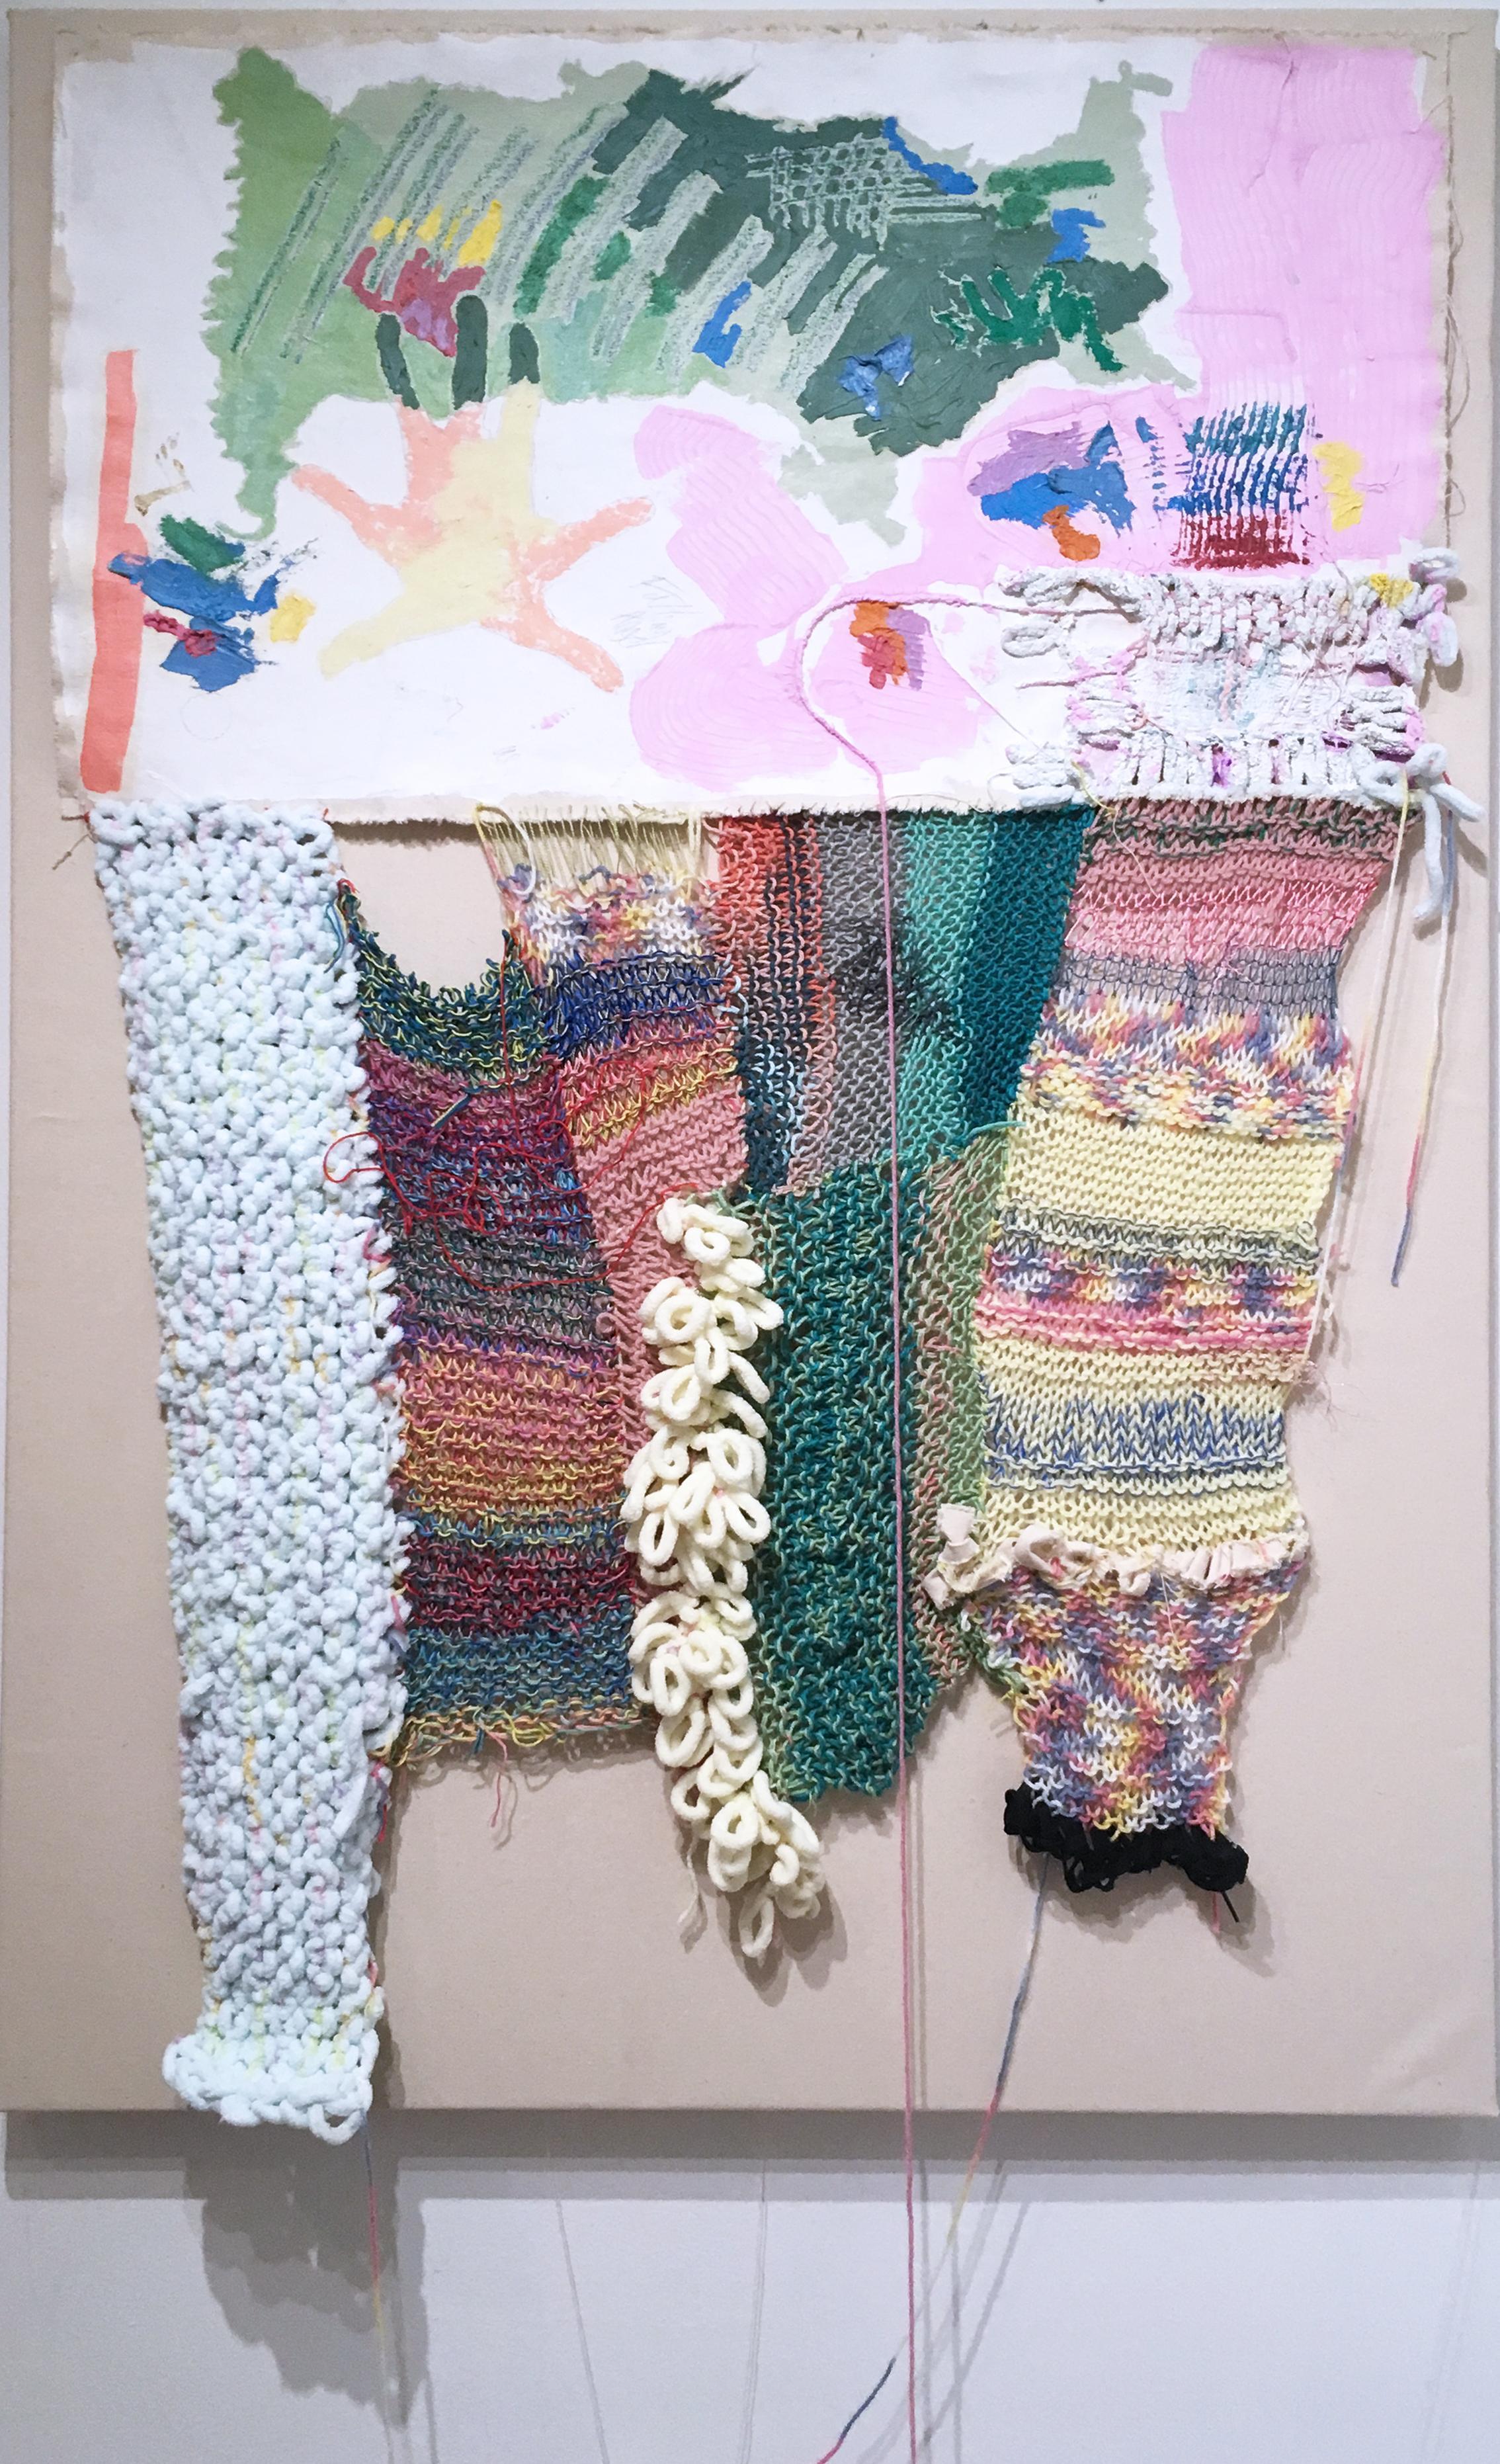 Falling Angel, 2020, acrylic, oil, canvas, yarn, thread, green, pink, abstract